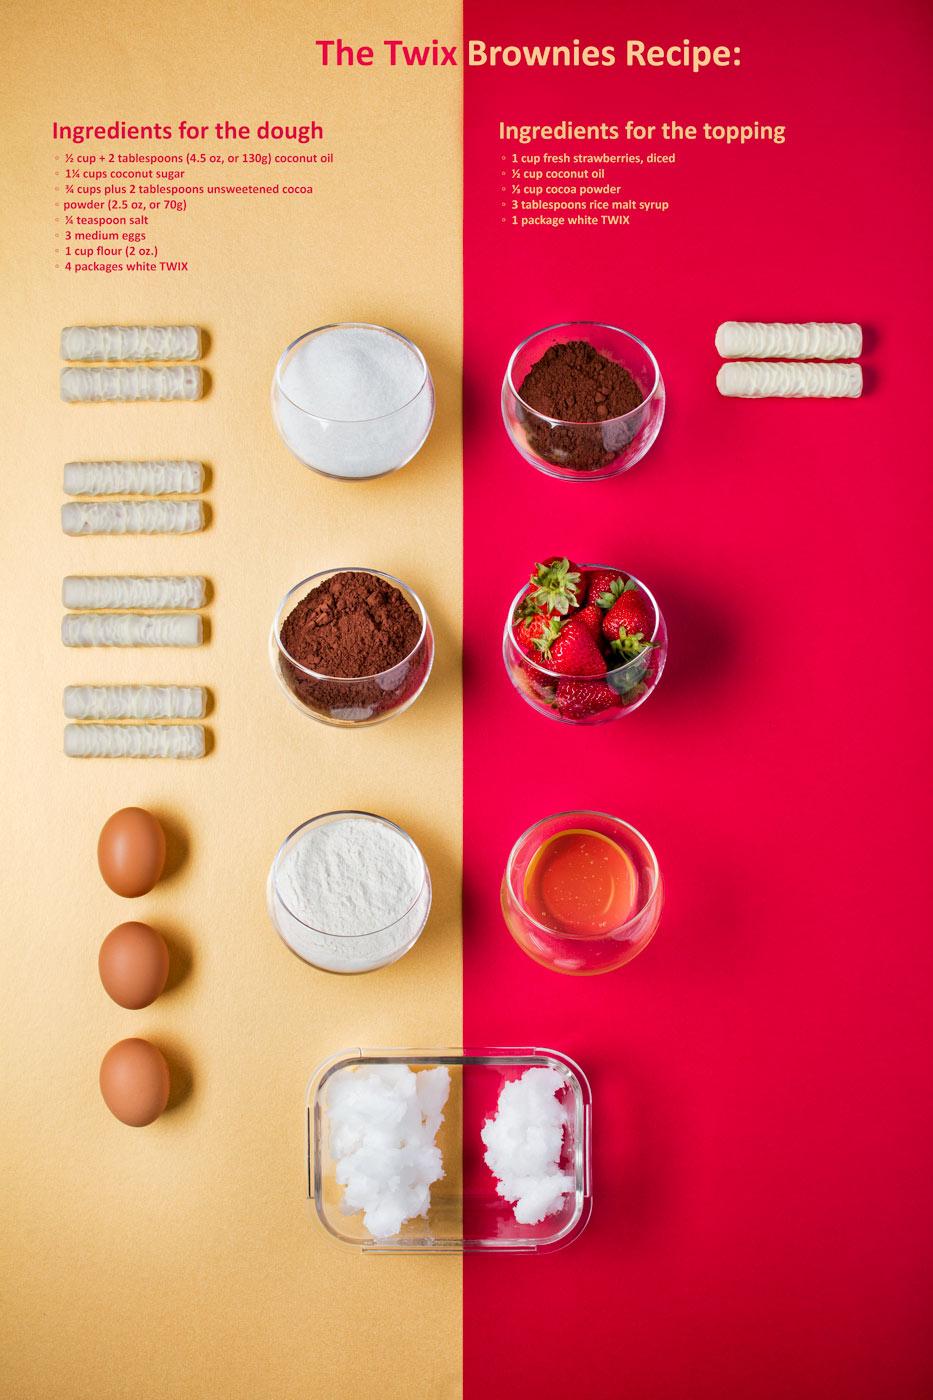 TWIX Peace-Brownies step by step recipe